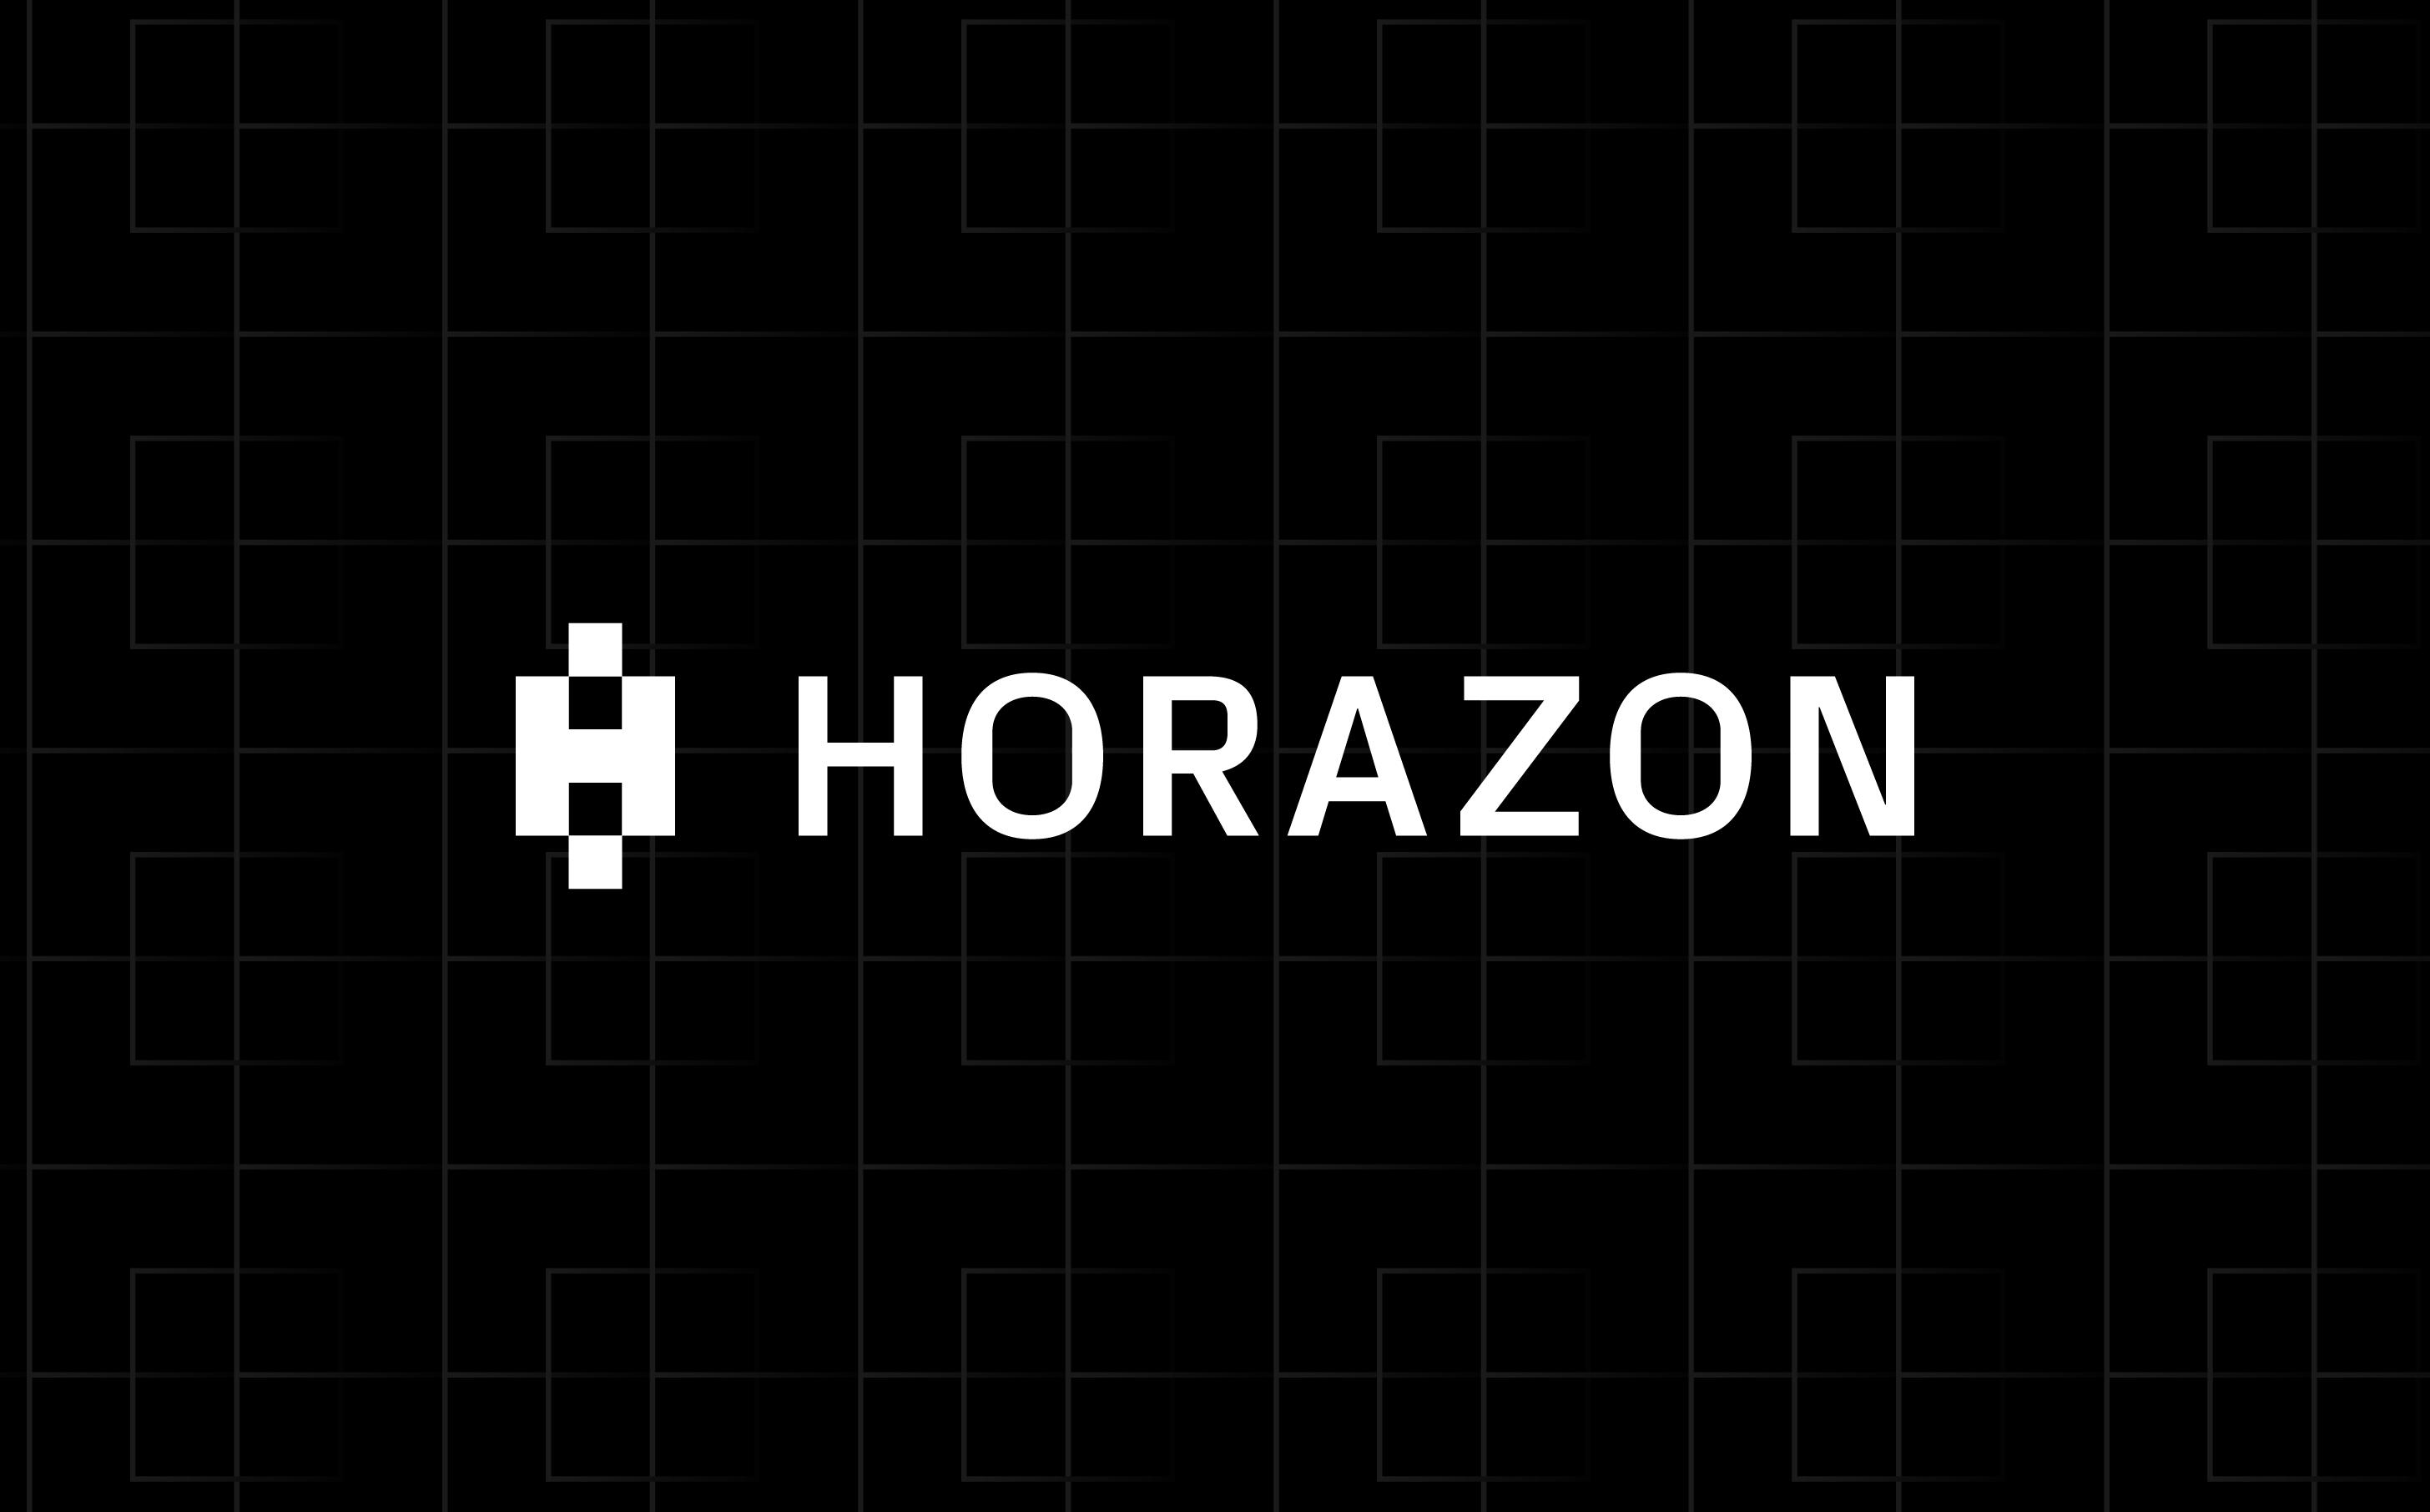 horazon-logo-design